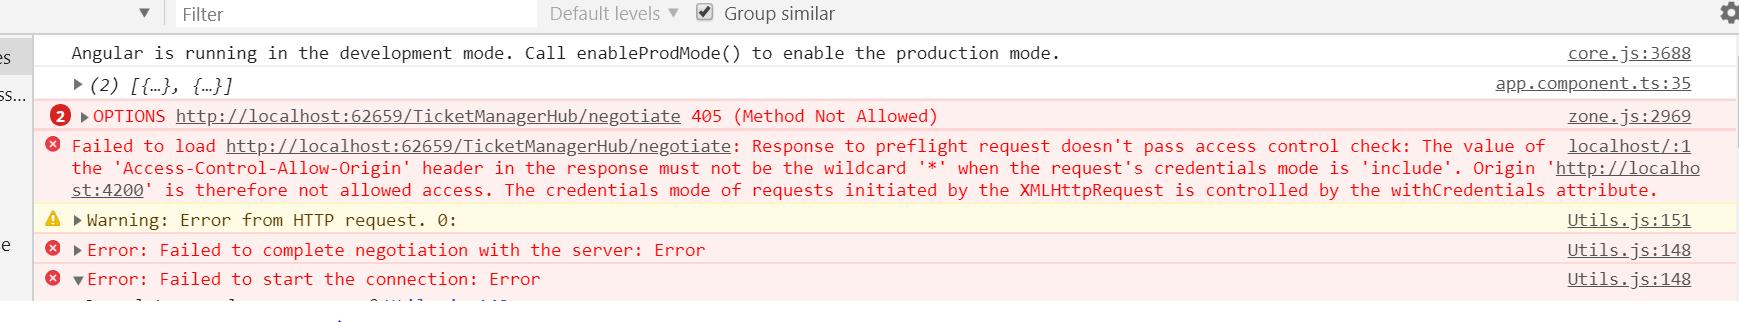 SignalR Javascript client CORS issue 'Access-Control-Allow-Origin